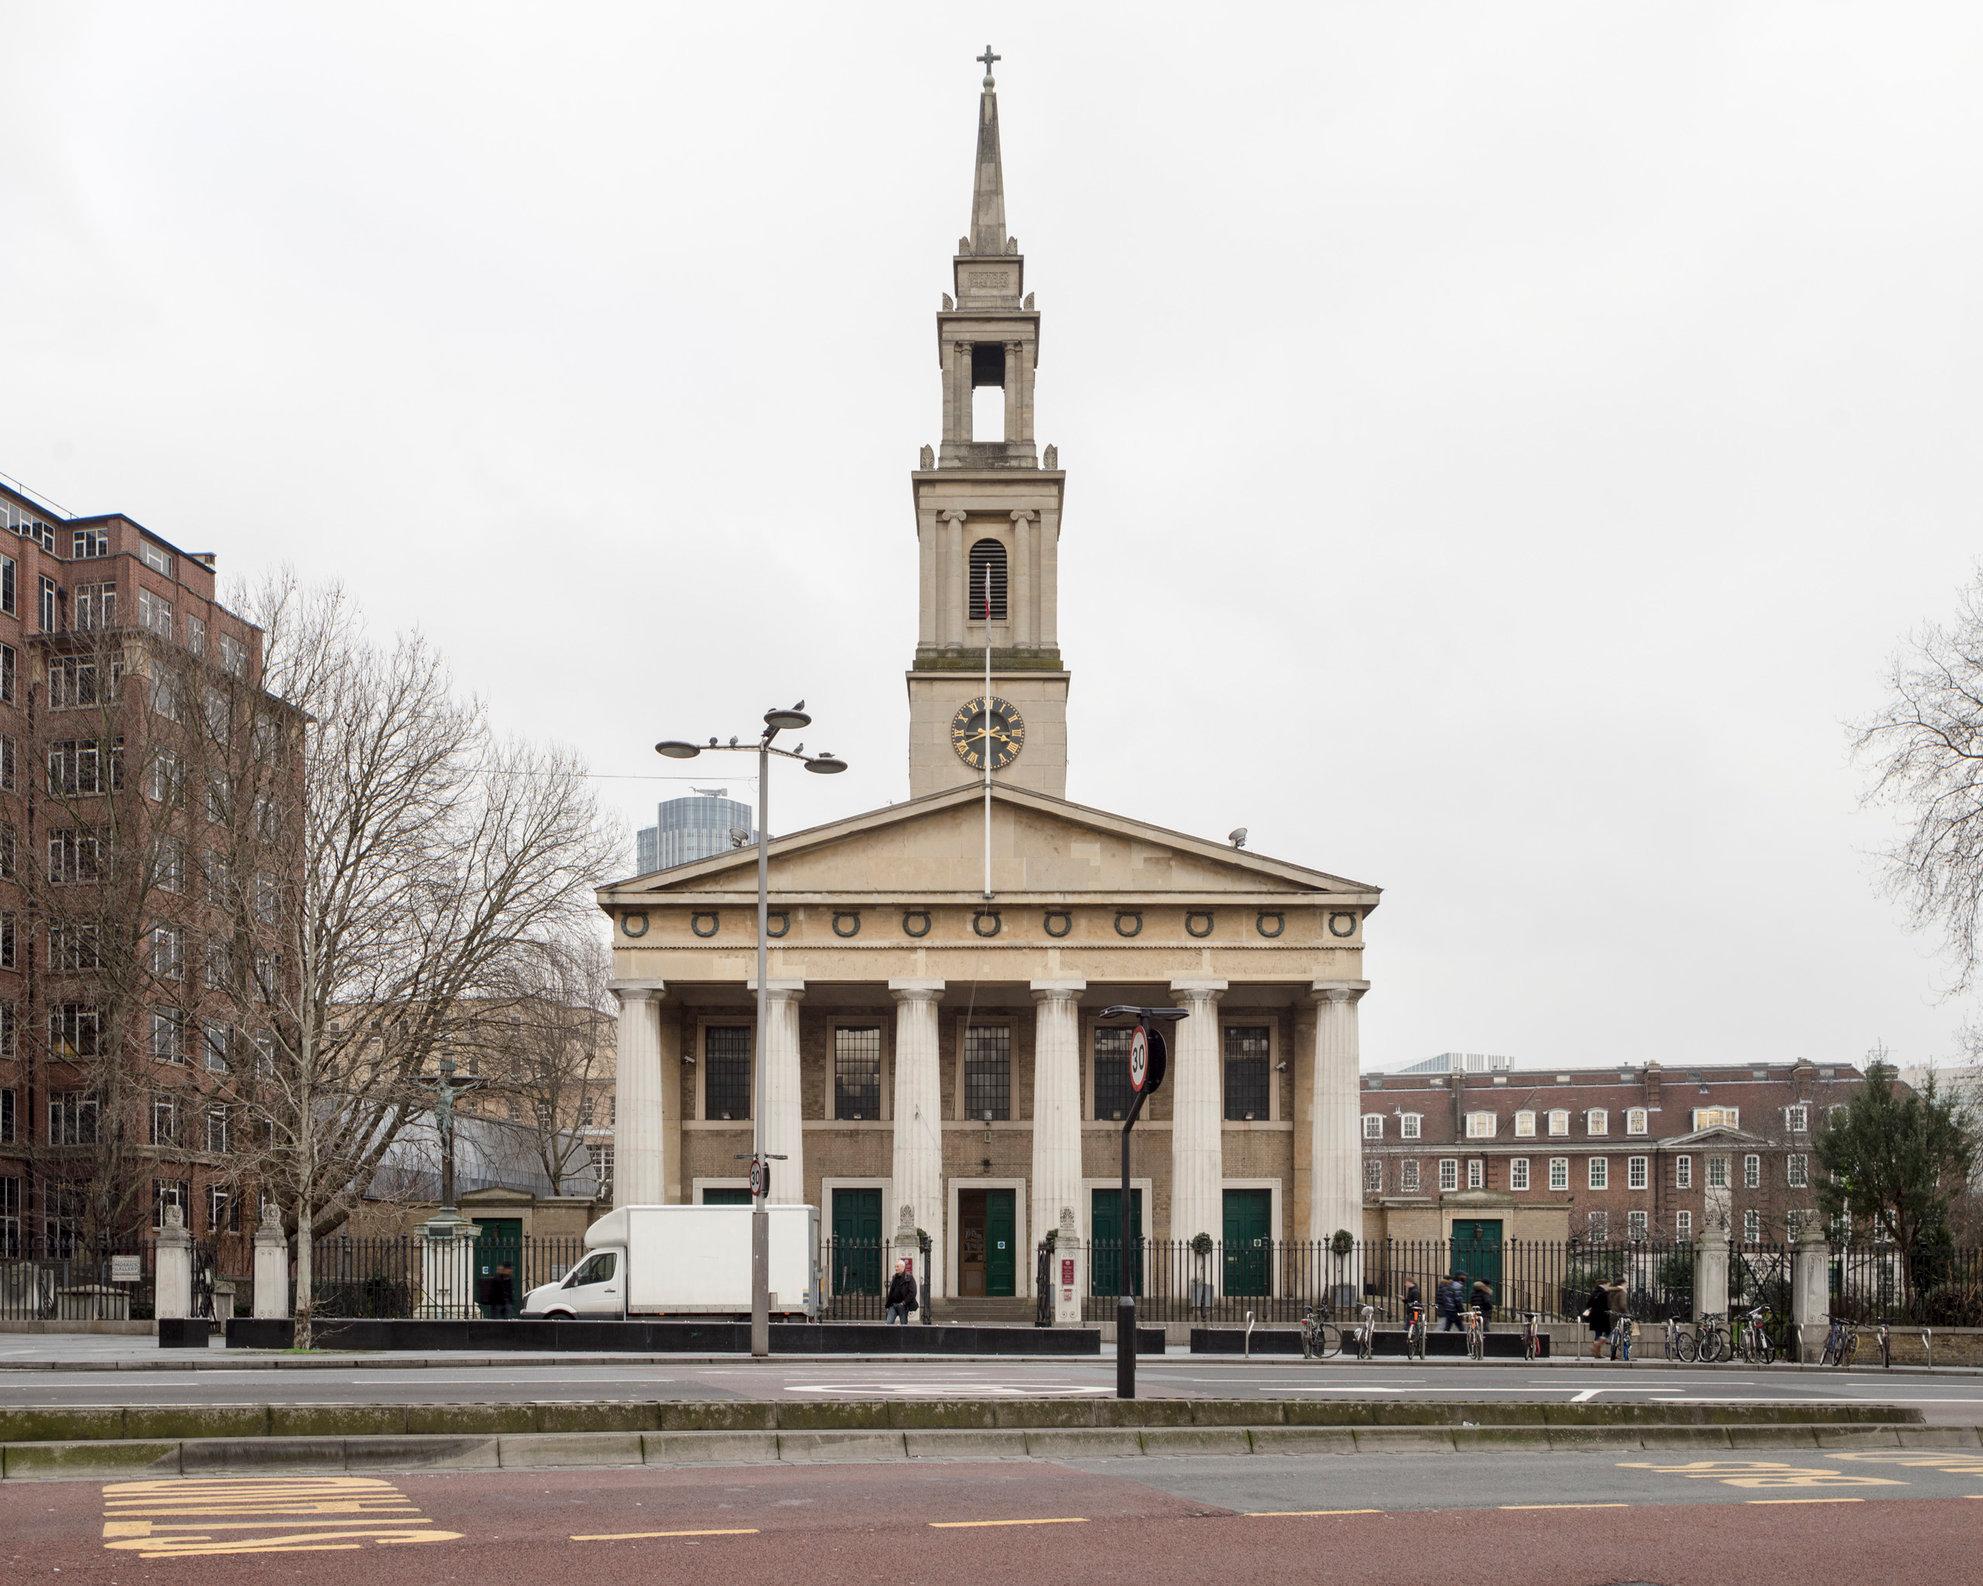 St John's Waterloo. Francis Octavius Bedford